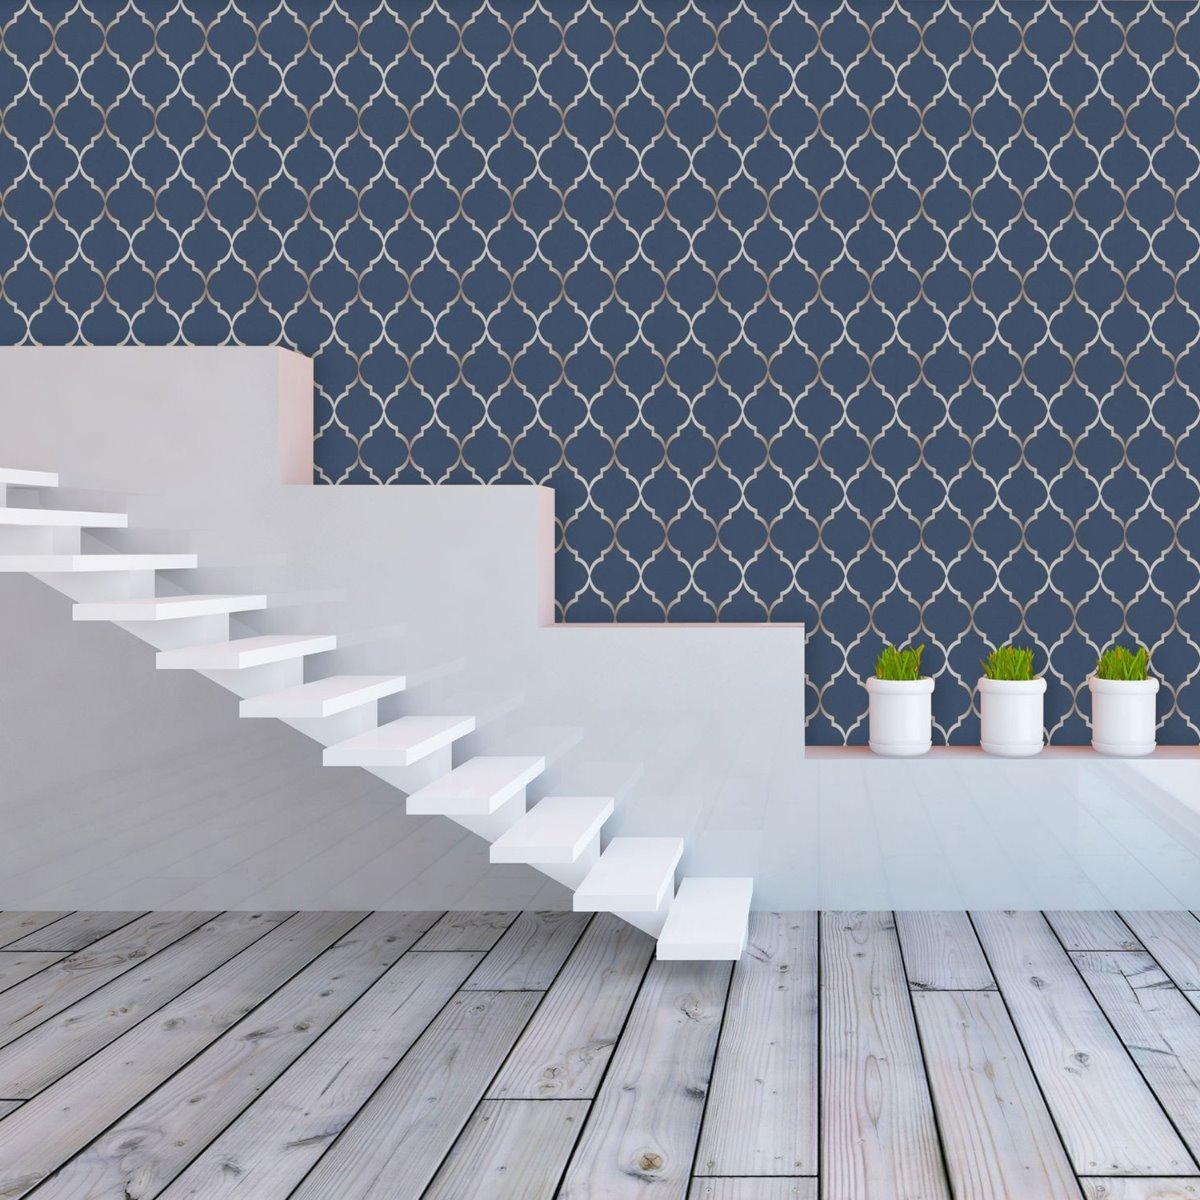 Fretwork Geometric Wallpaper Midnight Blue Rasch